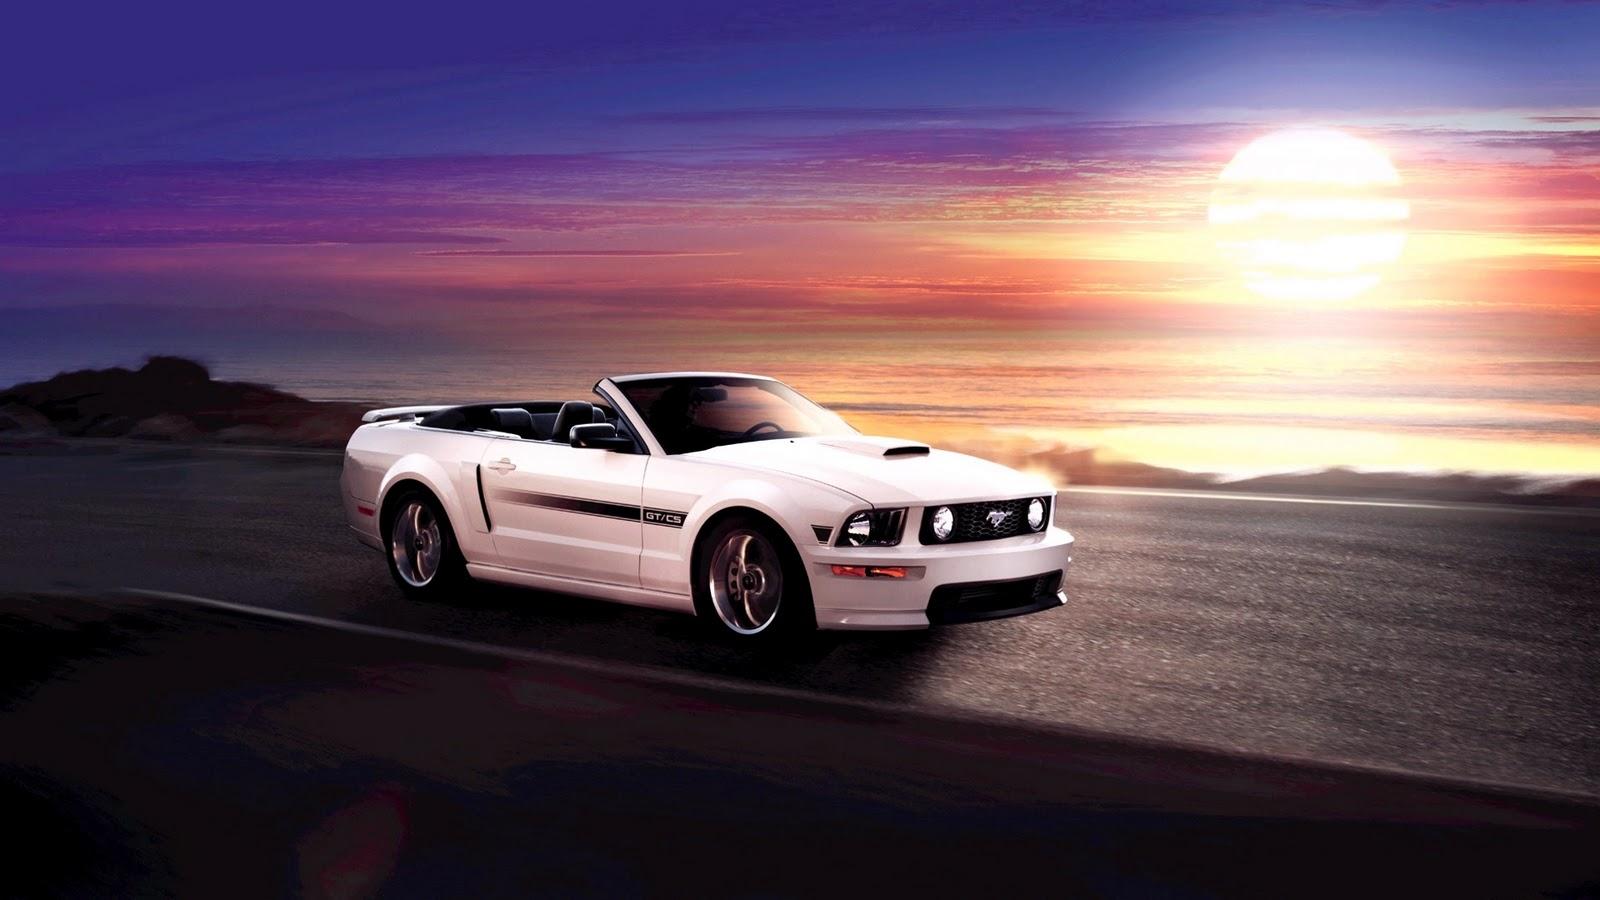 Best Desktop HD Wallpapers: Ford Mustang